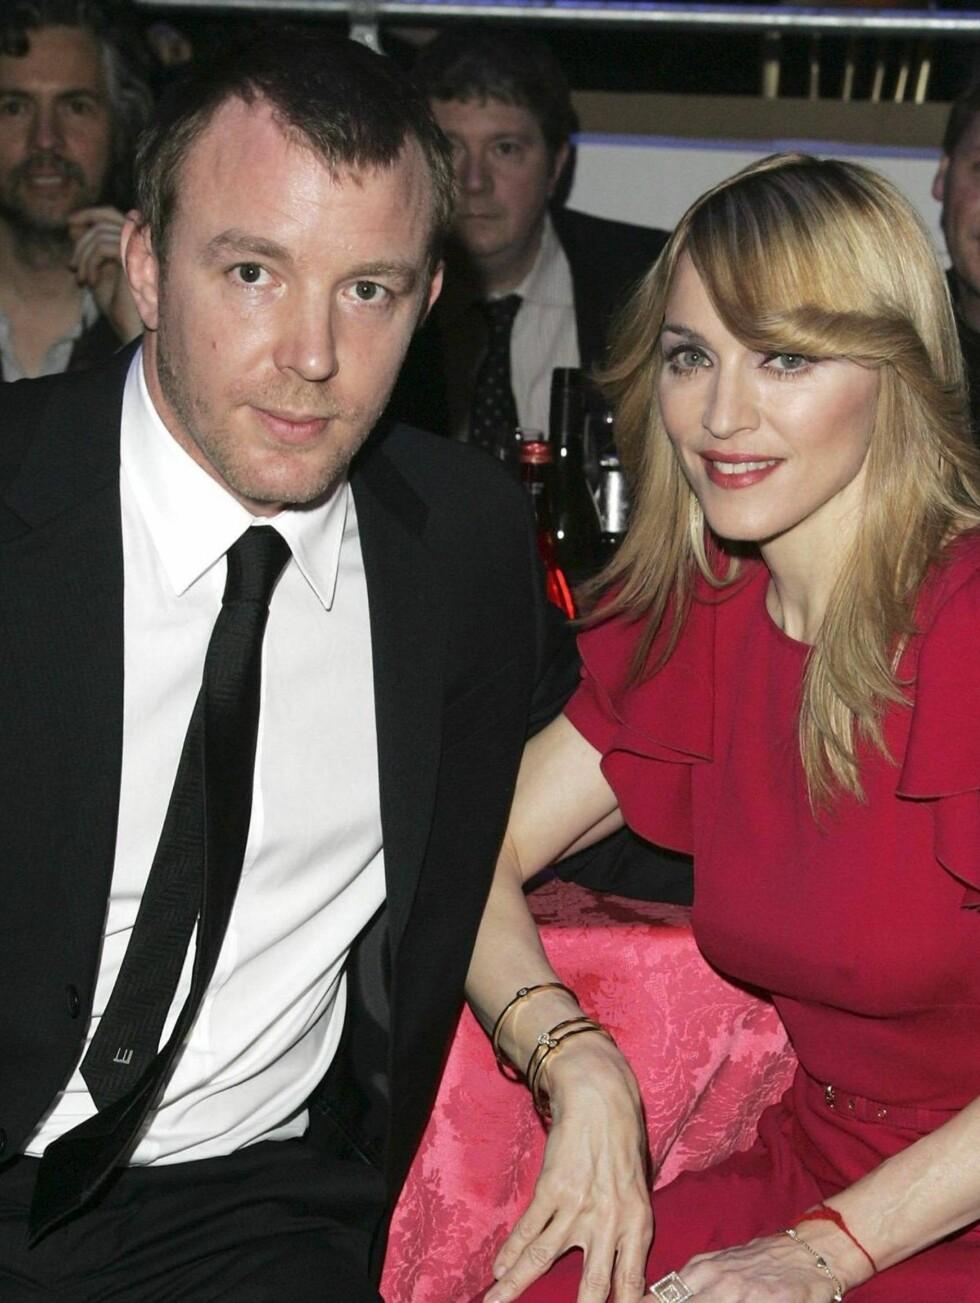 HJEMMEFAR: Madonna er for tiden ute på turné. Guy har ikke jobbet med film siden i fjor. Foto: All Over Press